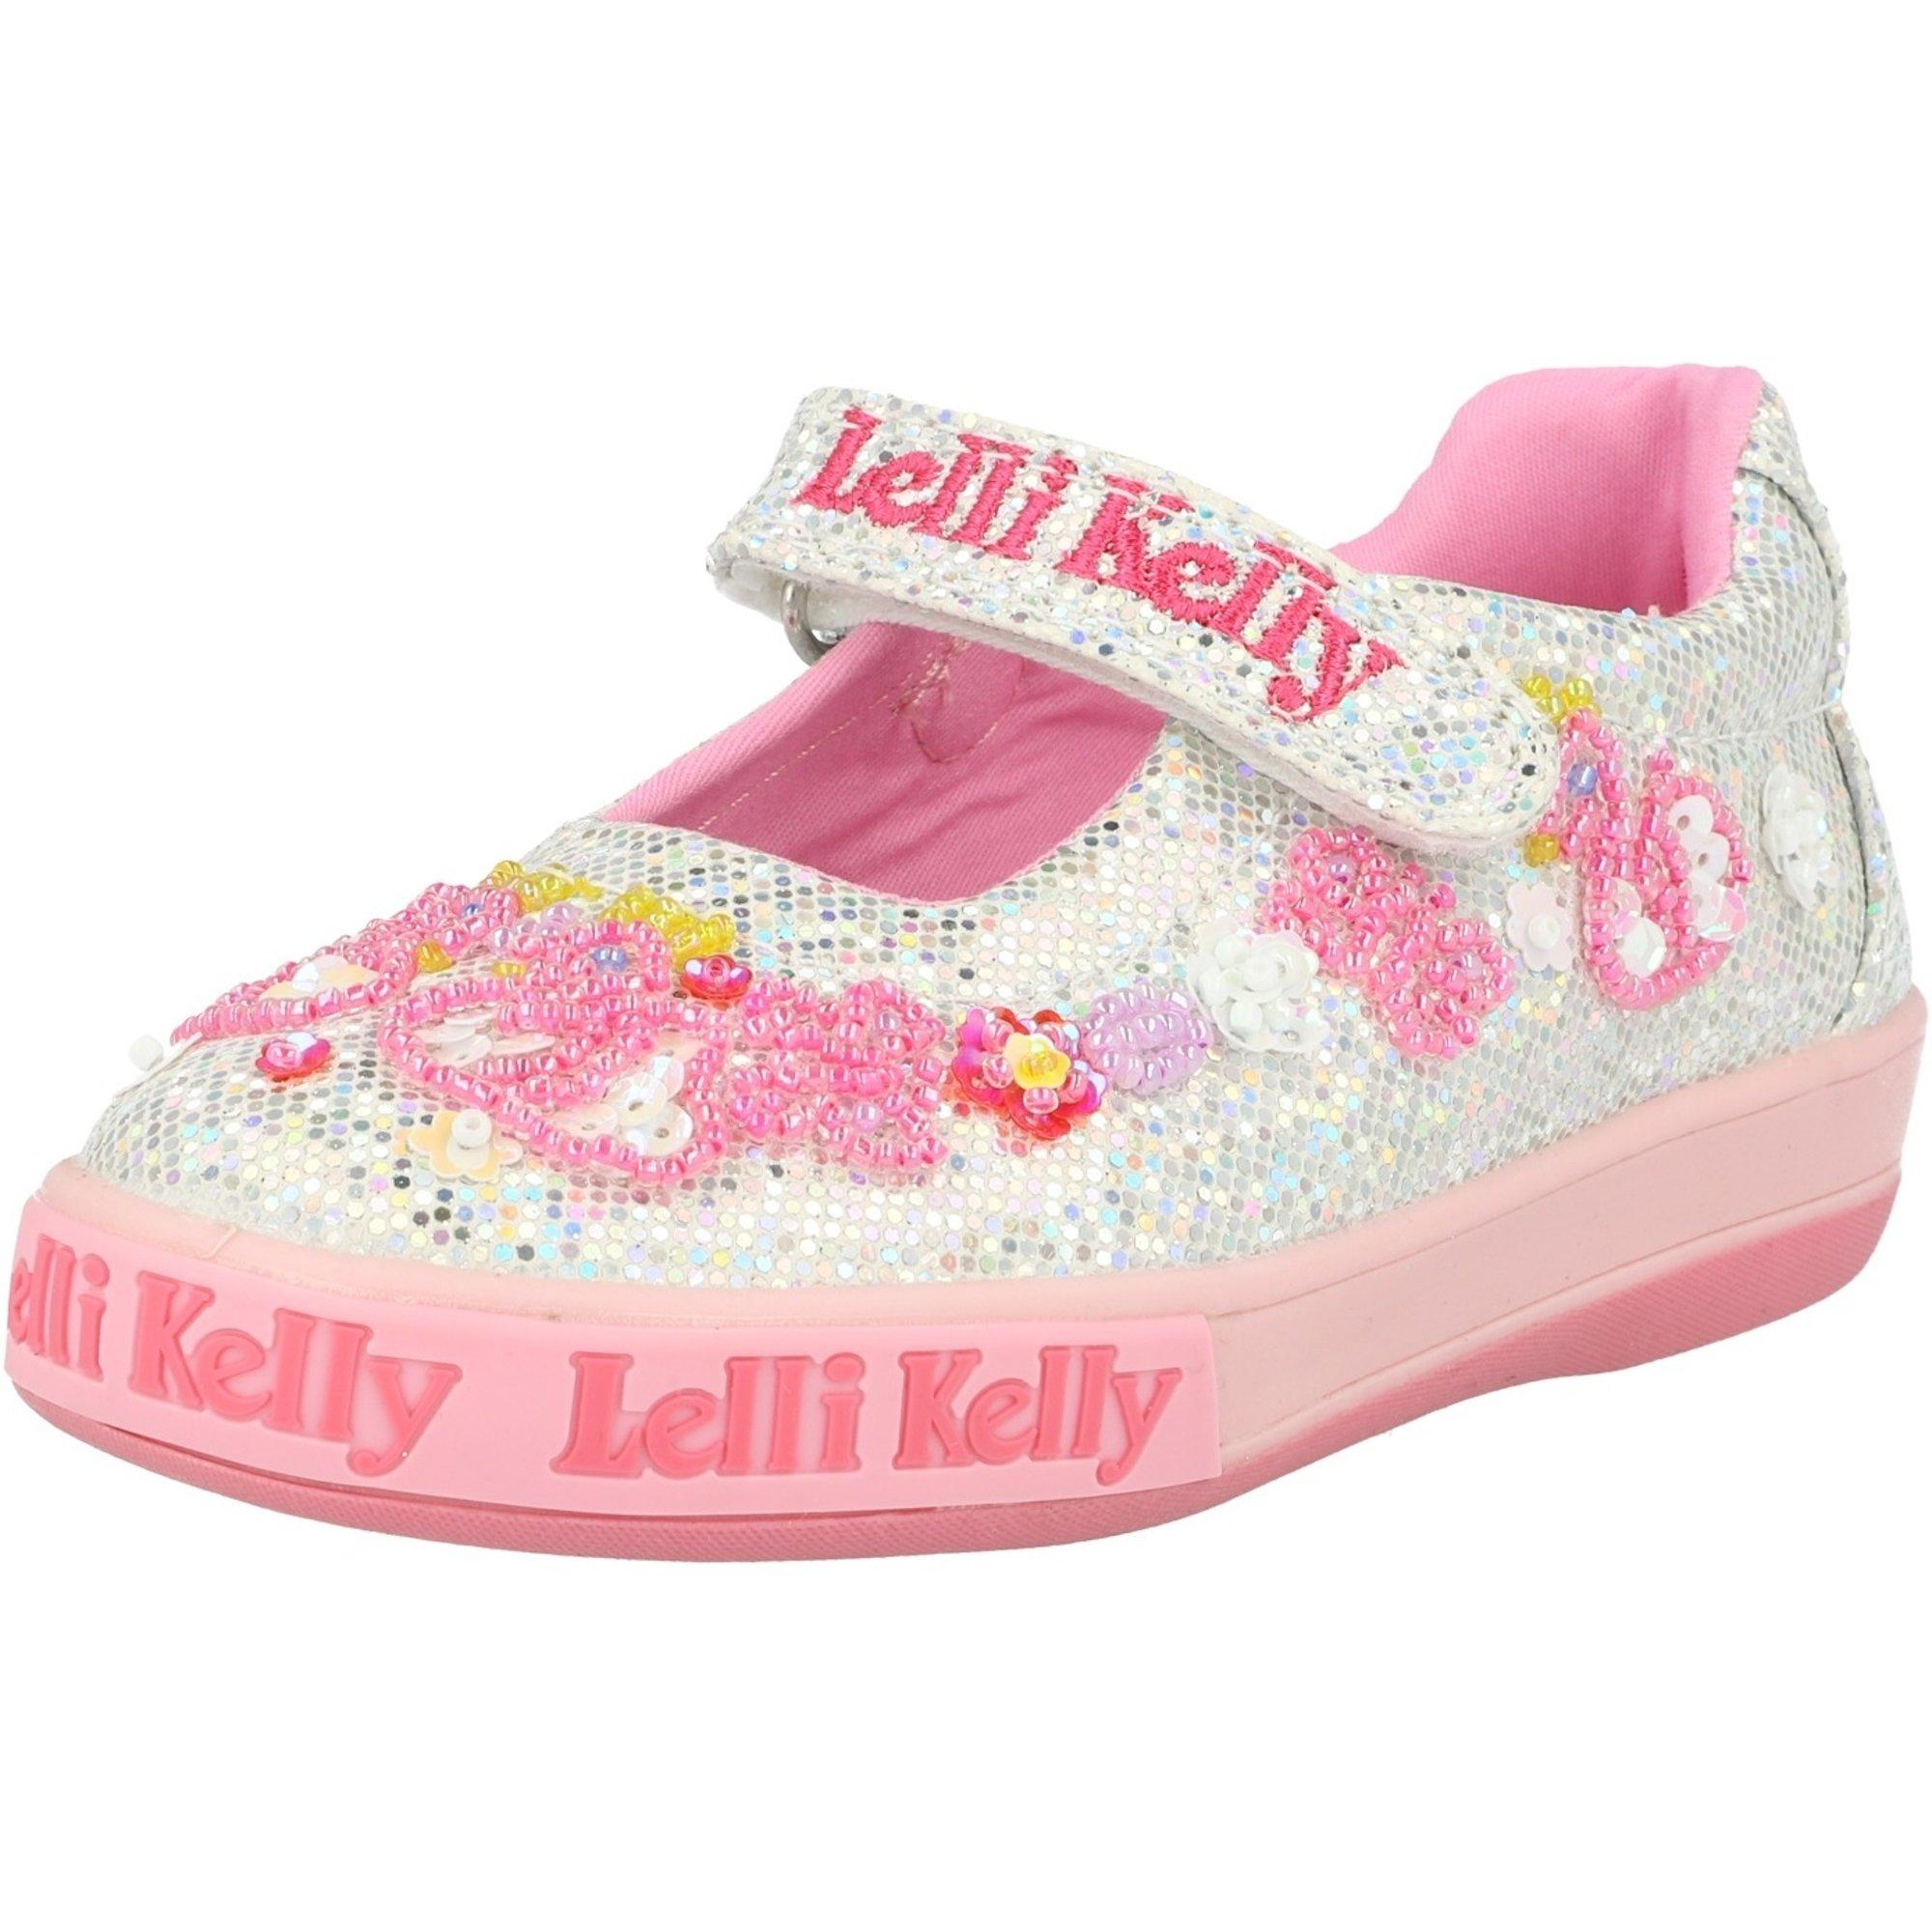 Lelli Kelly Leda Dolly Silver Glitter